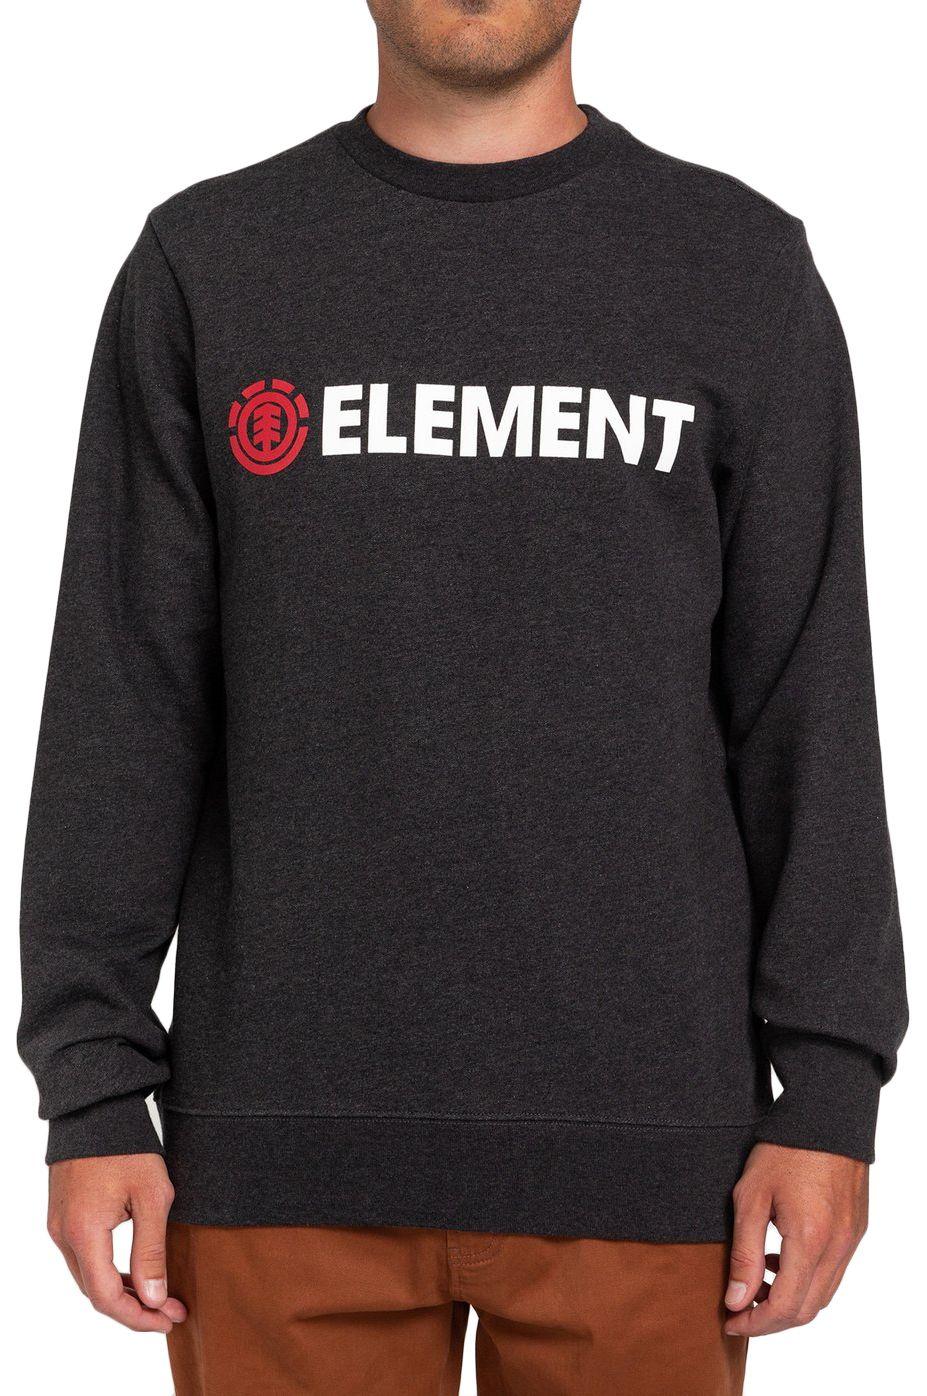 Element Crew Sweat BLAZIN CR Charcoal Heather